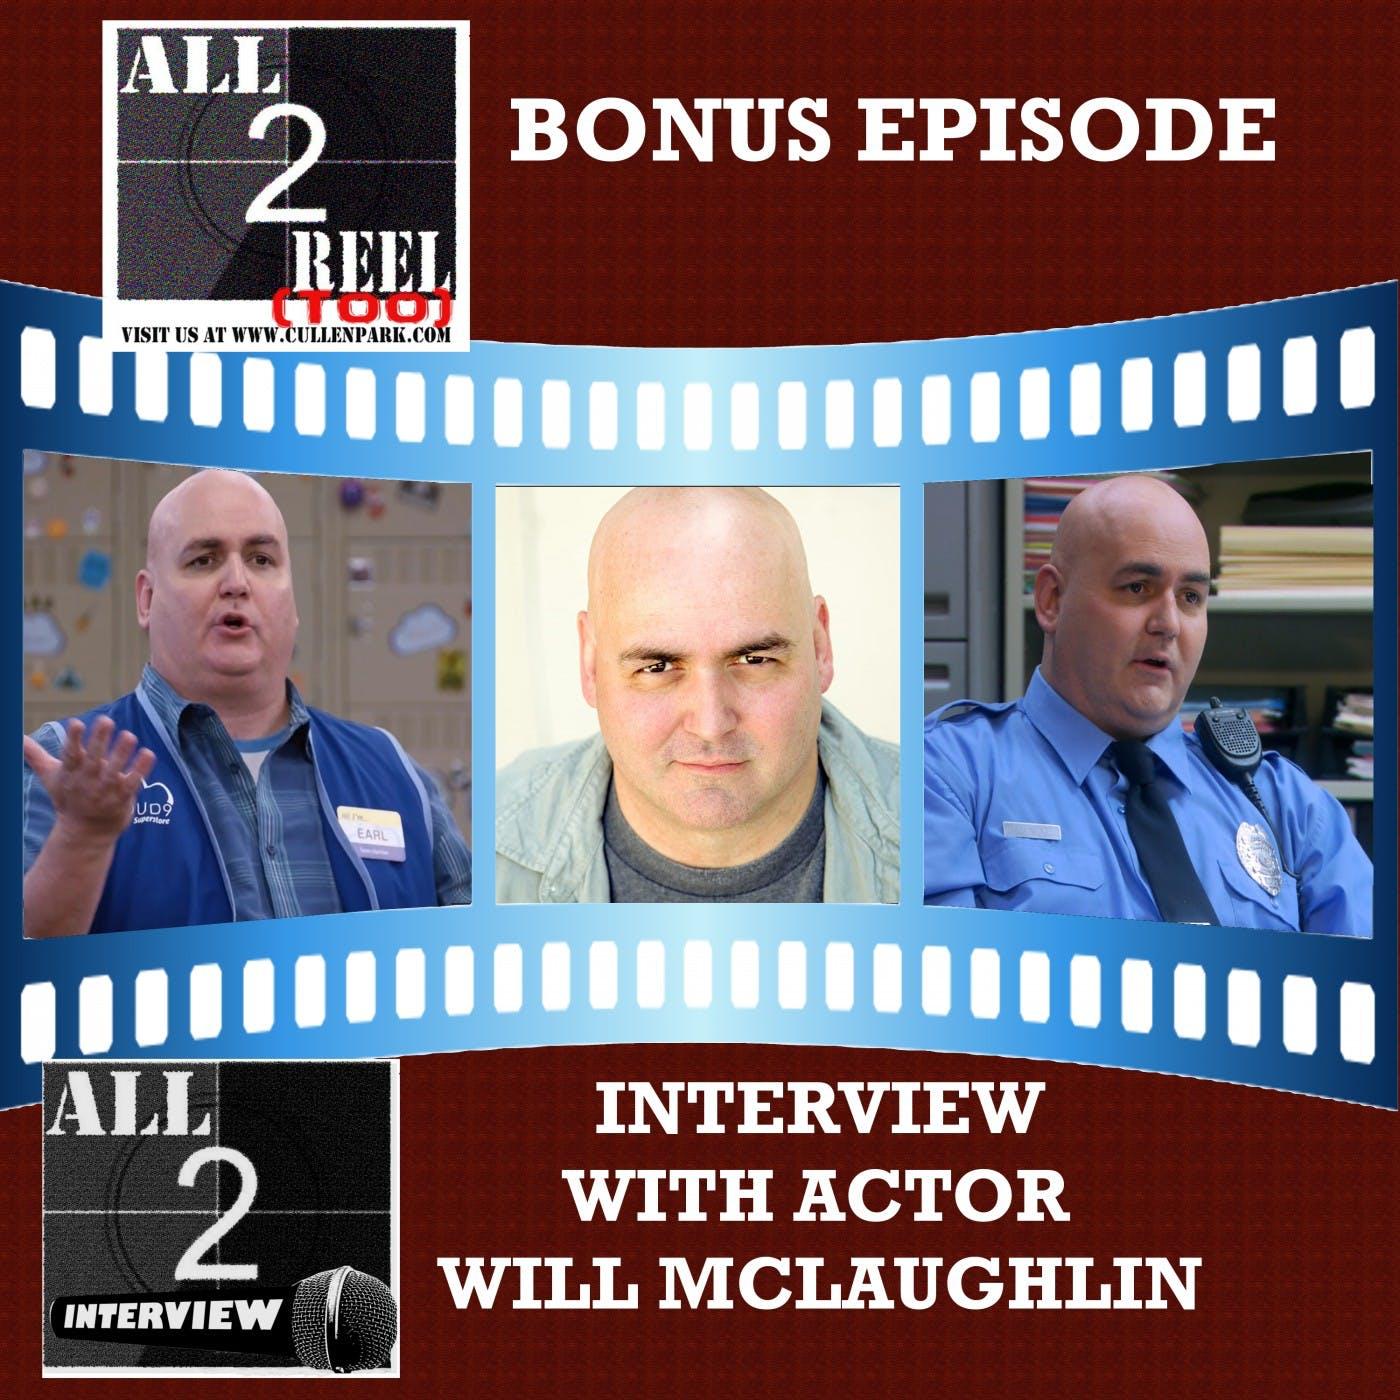 WILL MCLAUGHLIN INTERVIEW